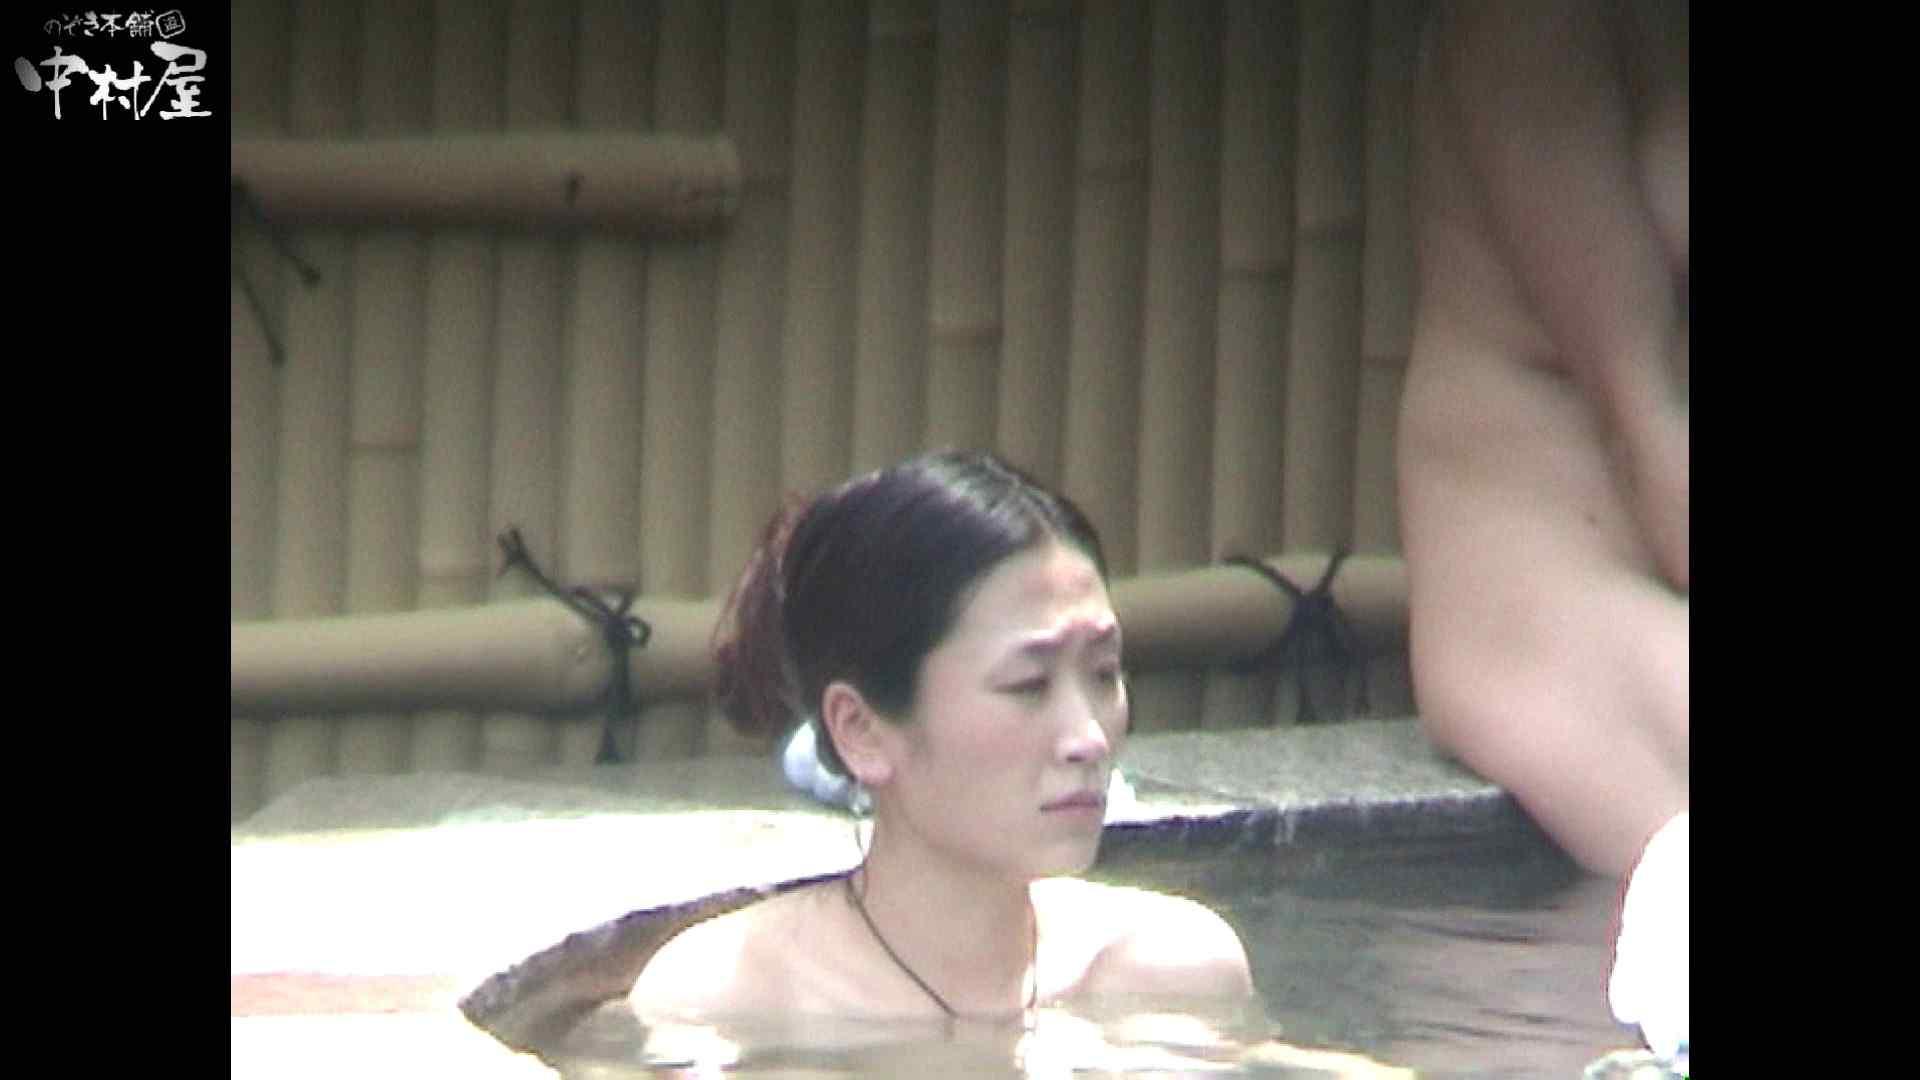 Aquaな露天風呂Vol.934 盗撮 AV無料 66画像 35